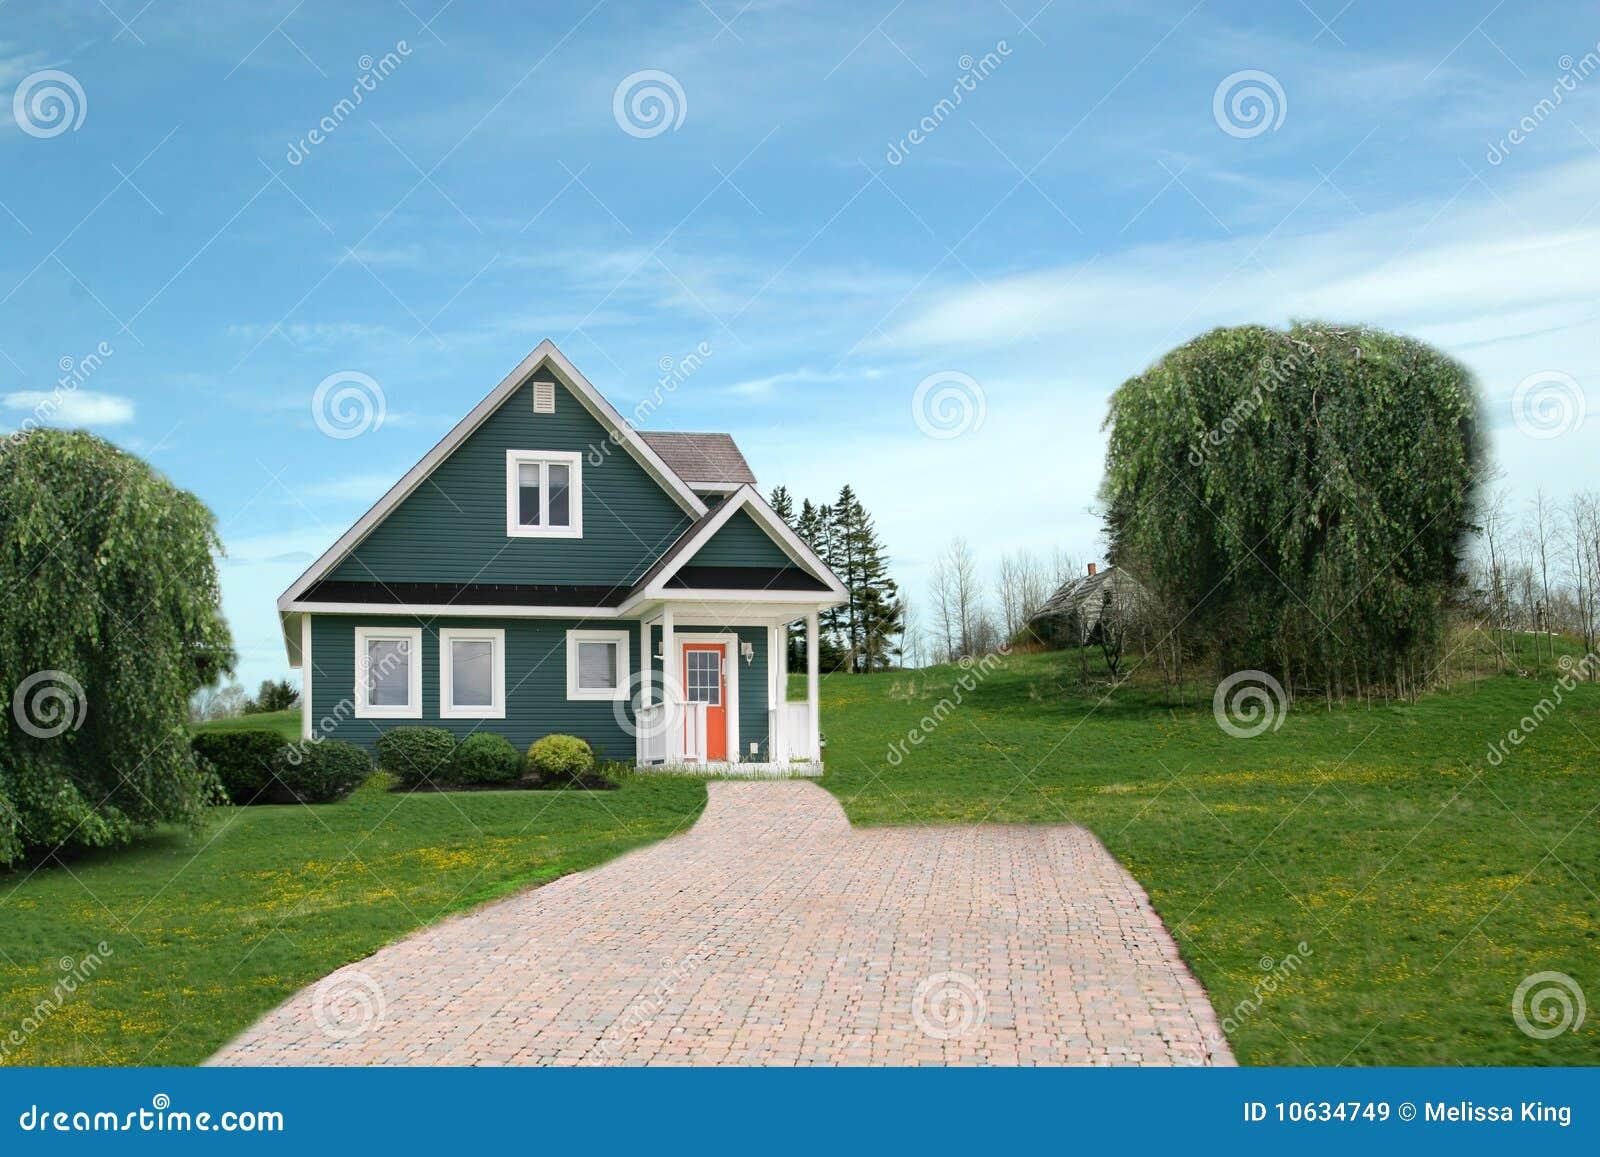 maison moderne dans la campagne images libres de droits image 10634749. Black Bedroom Furniture Sets. Home Design Ideas